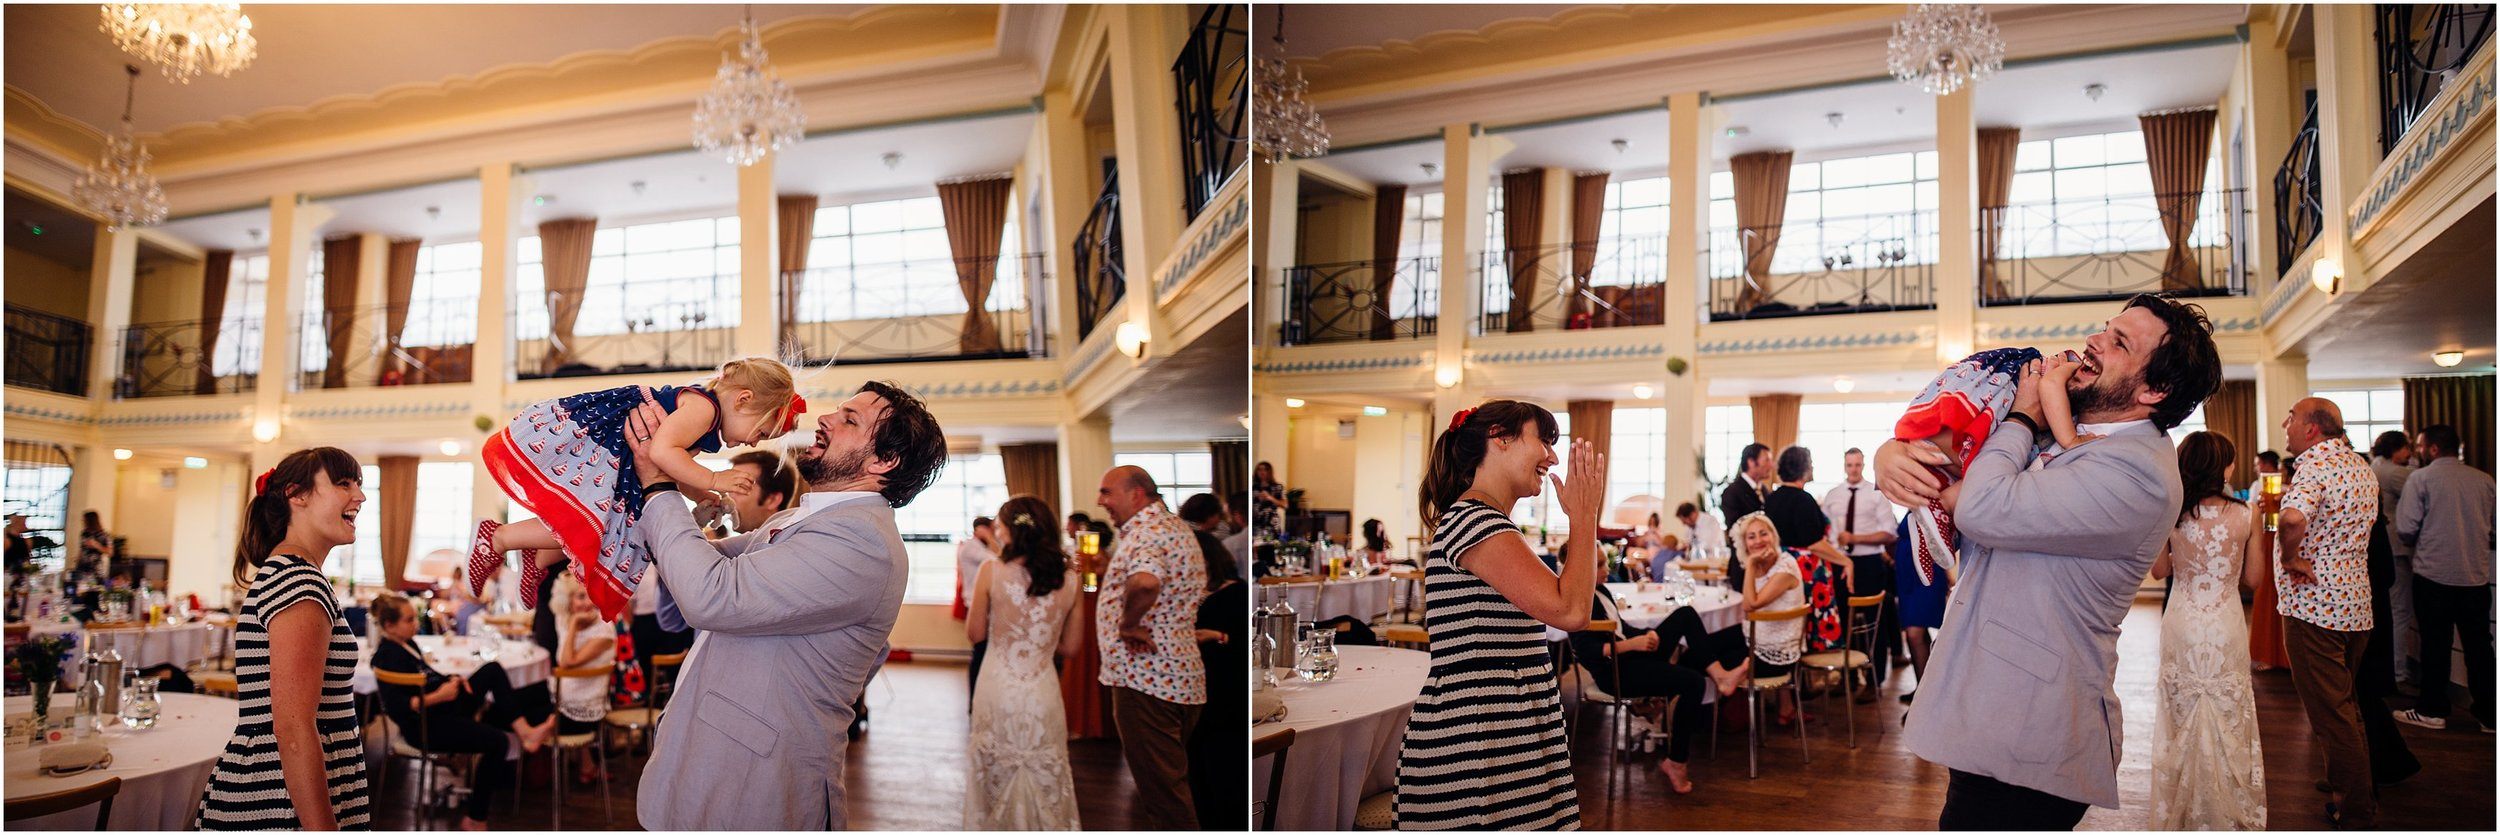 Art Deco Worthing Pier Wedding_0074.jpg